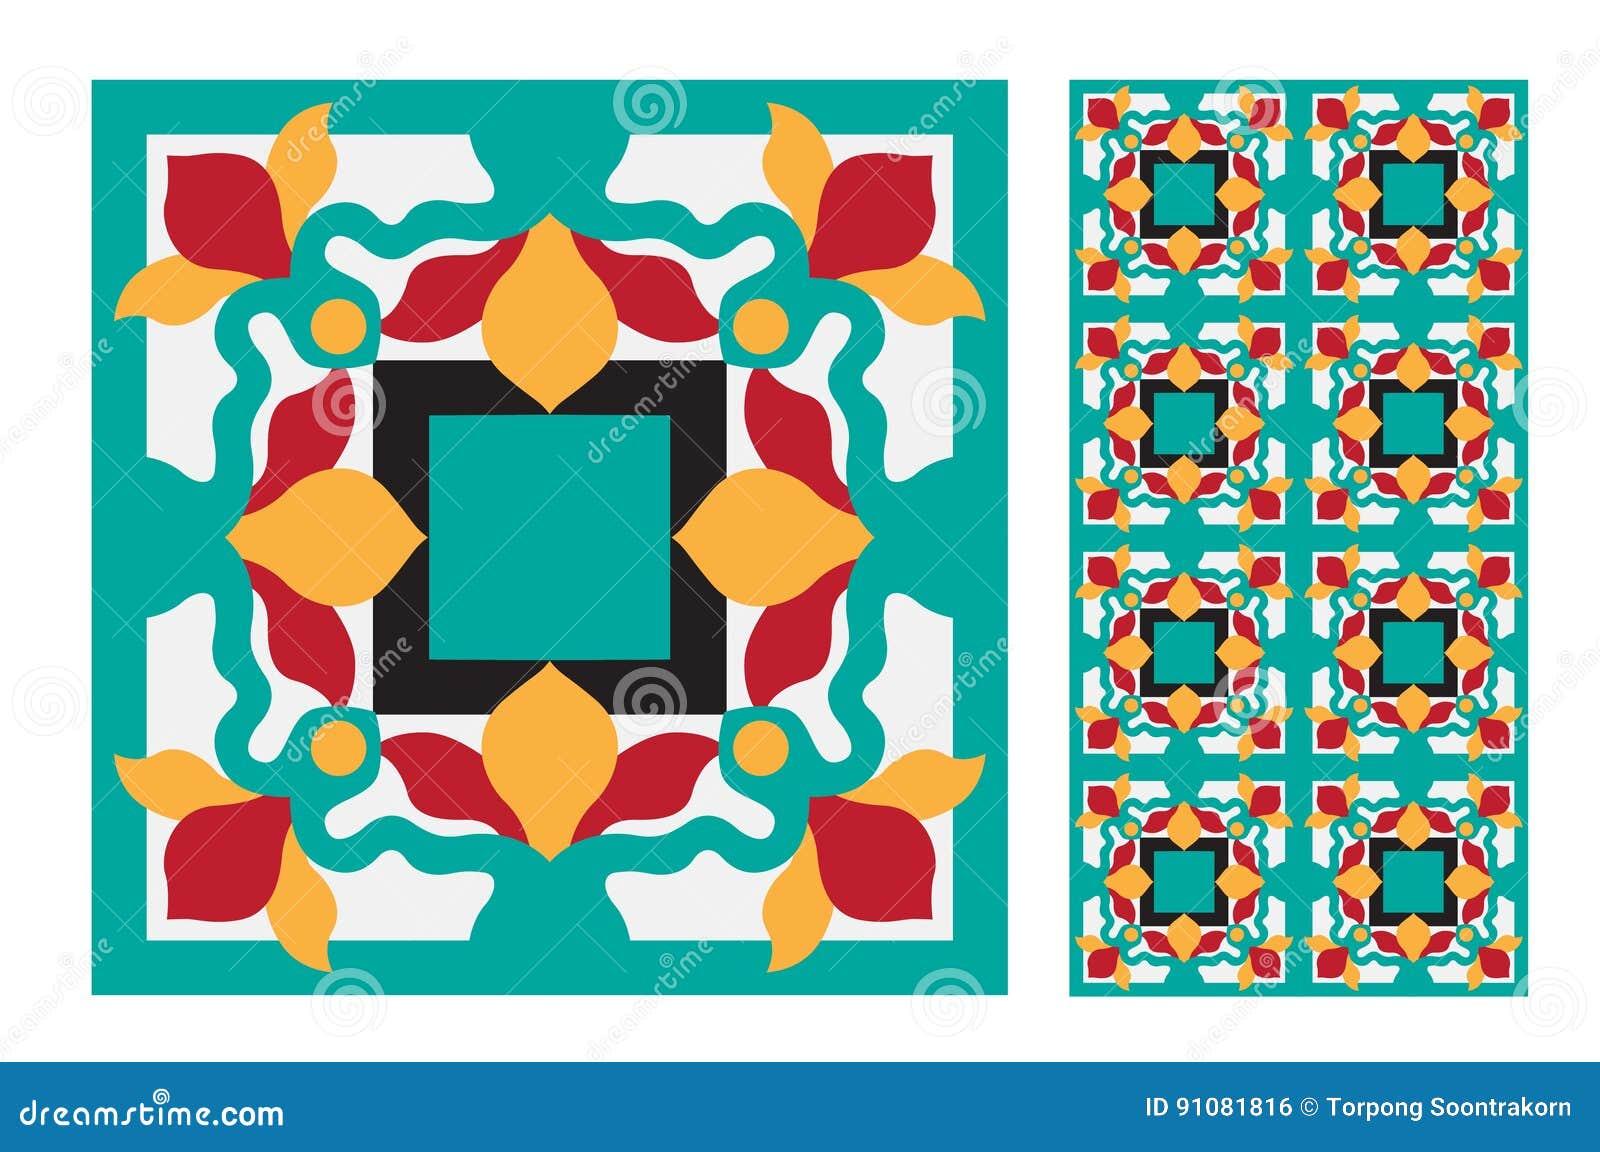 Vintage tile stock vector. Illustration of fabric, design - 91081816